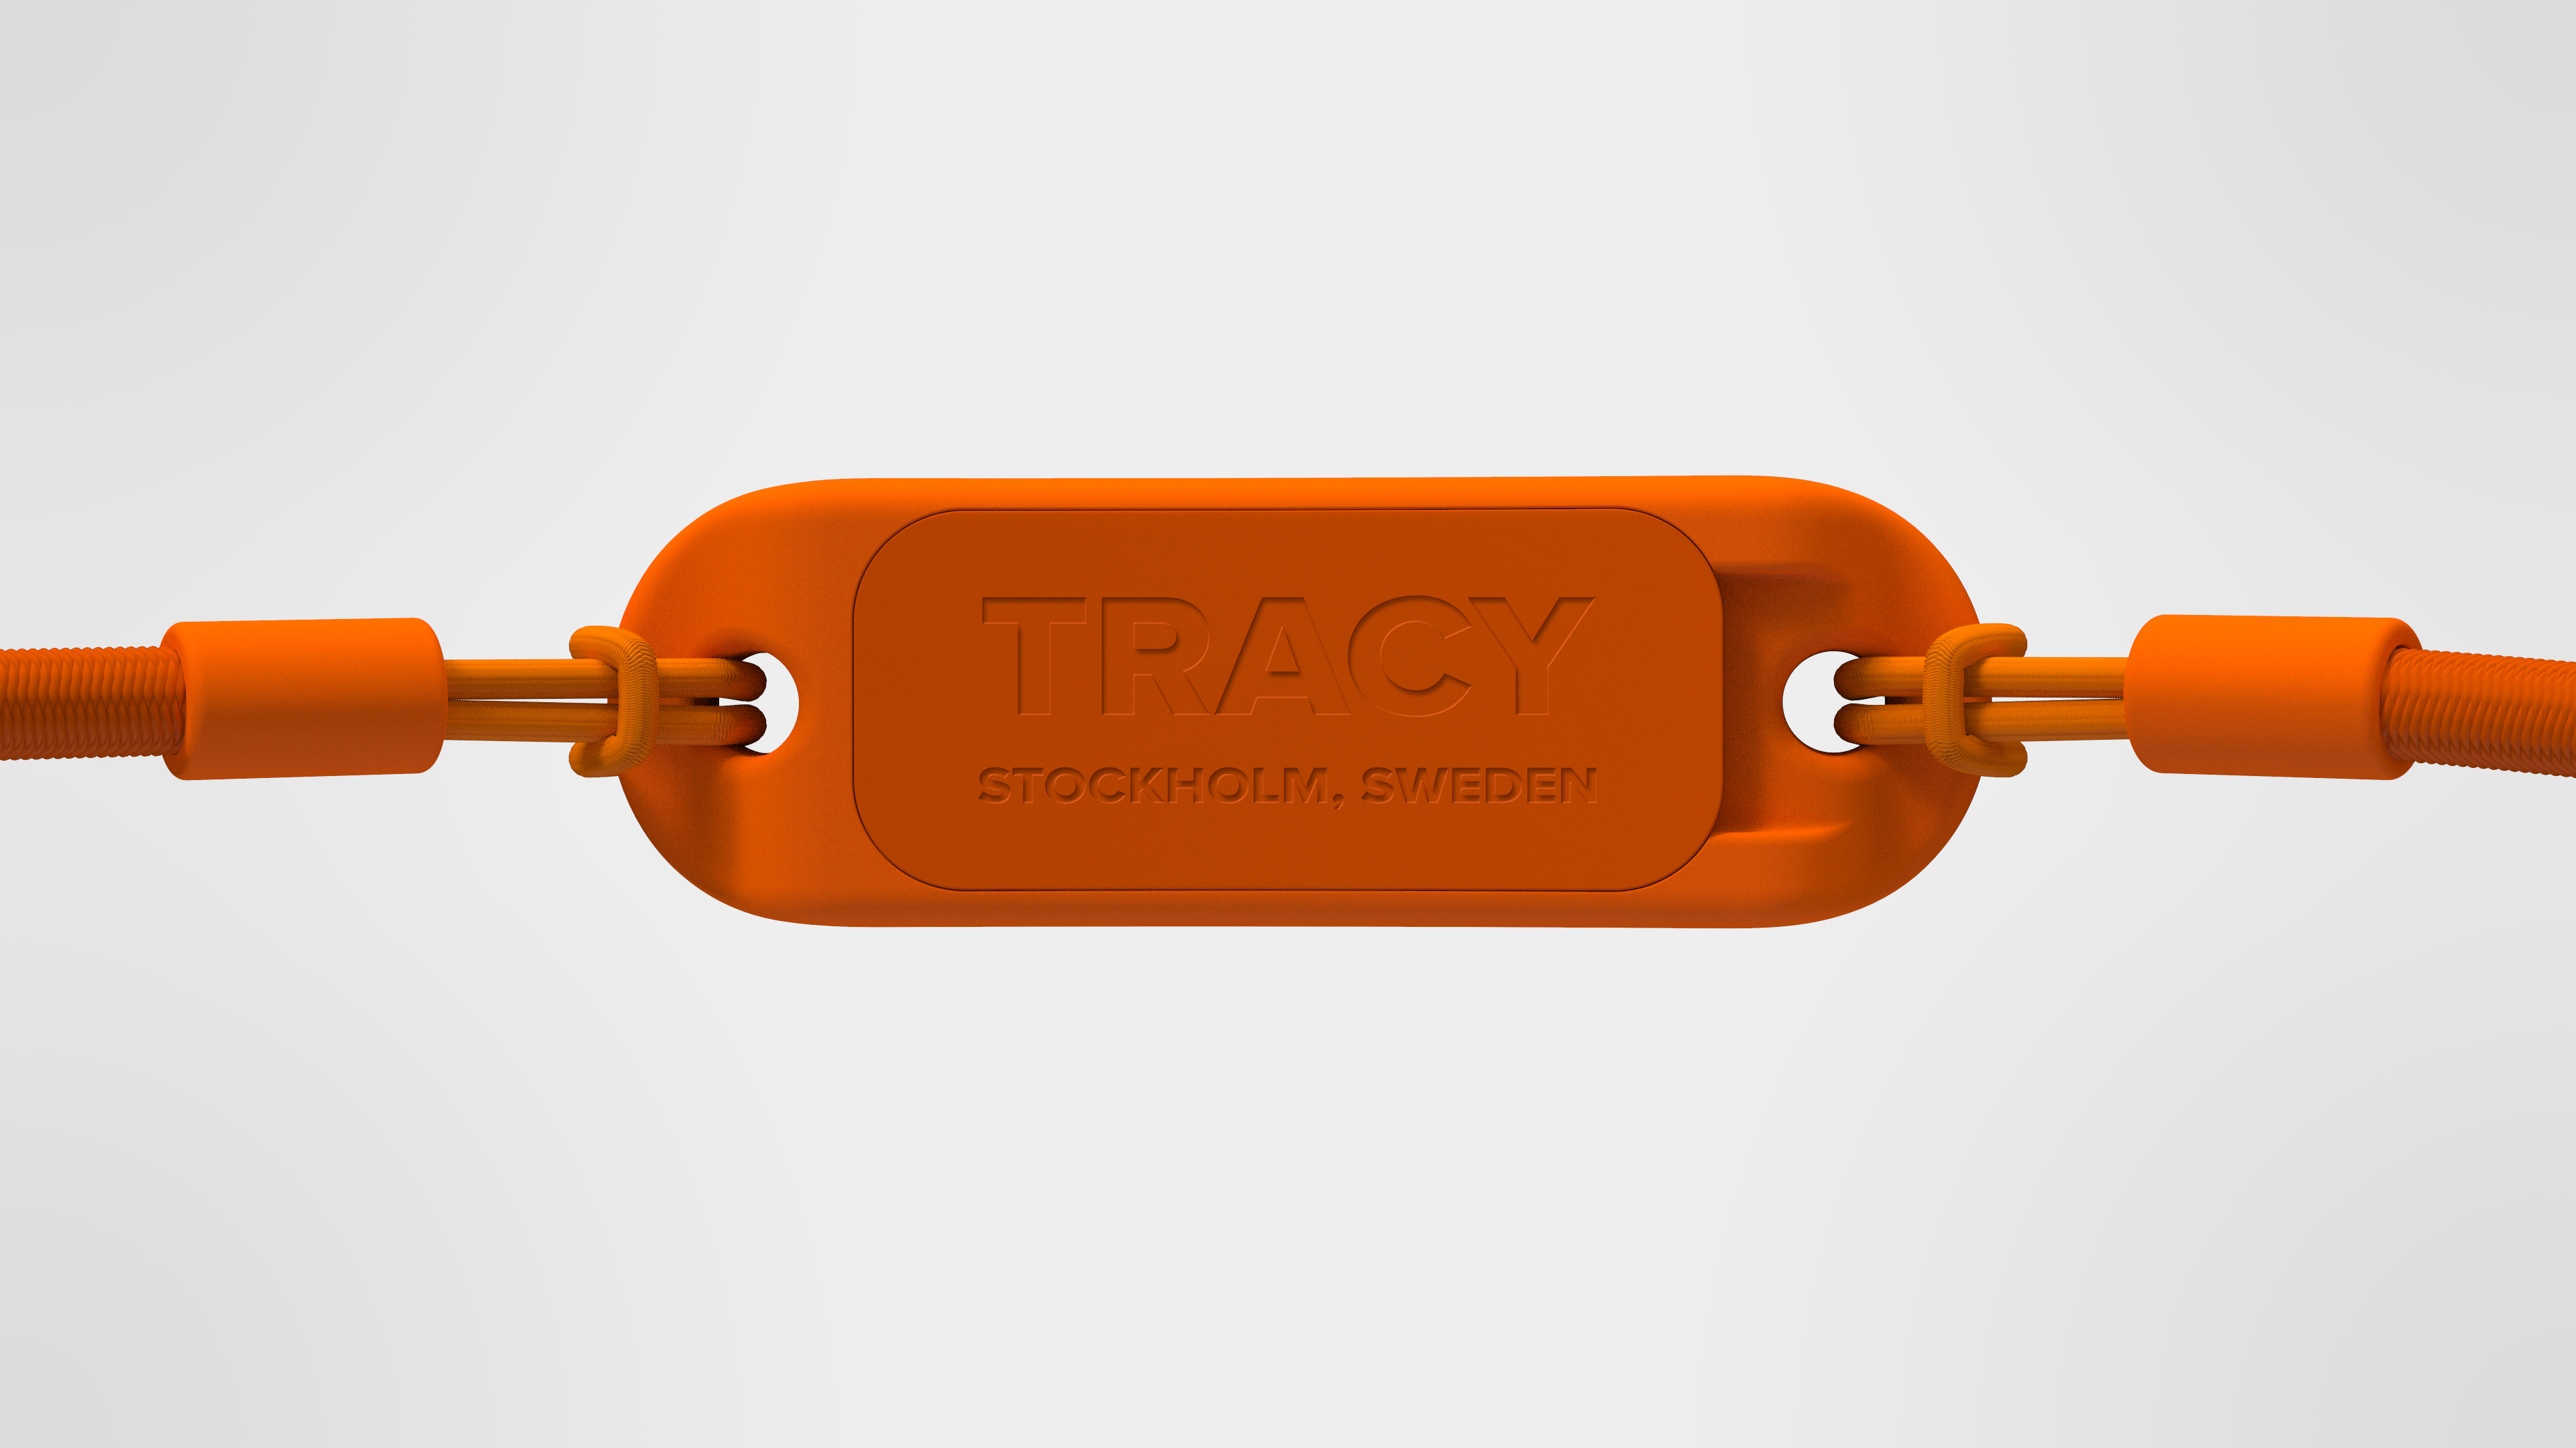 Artan Mansouri dog tracker Tracy Product design prototype.